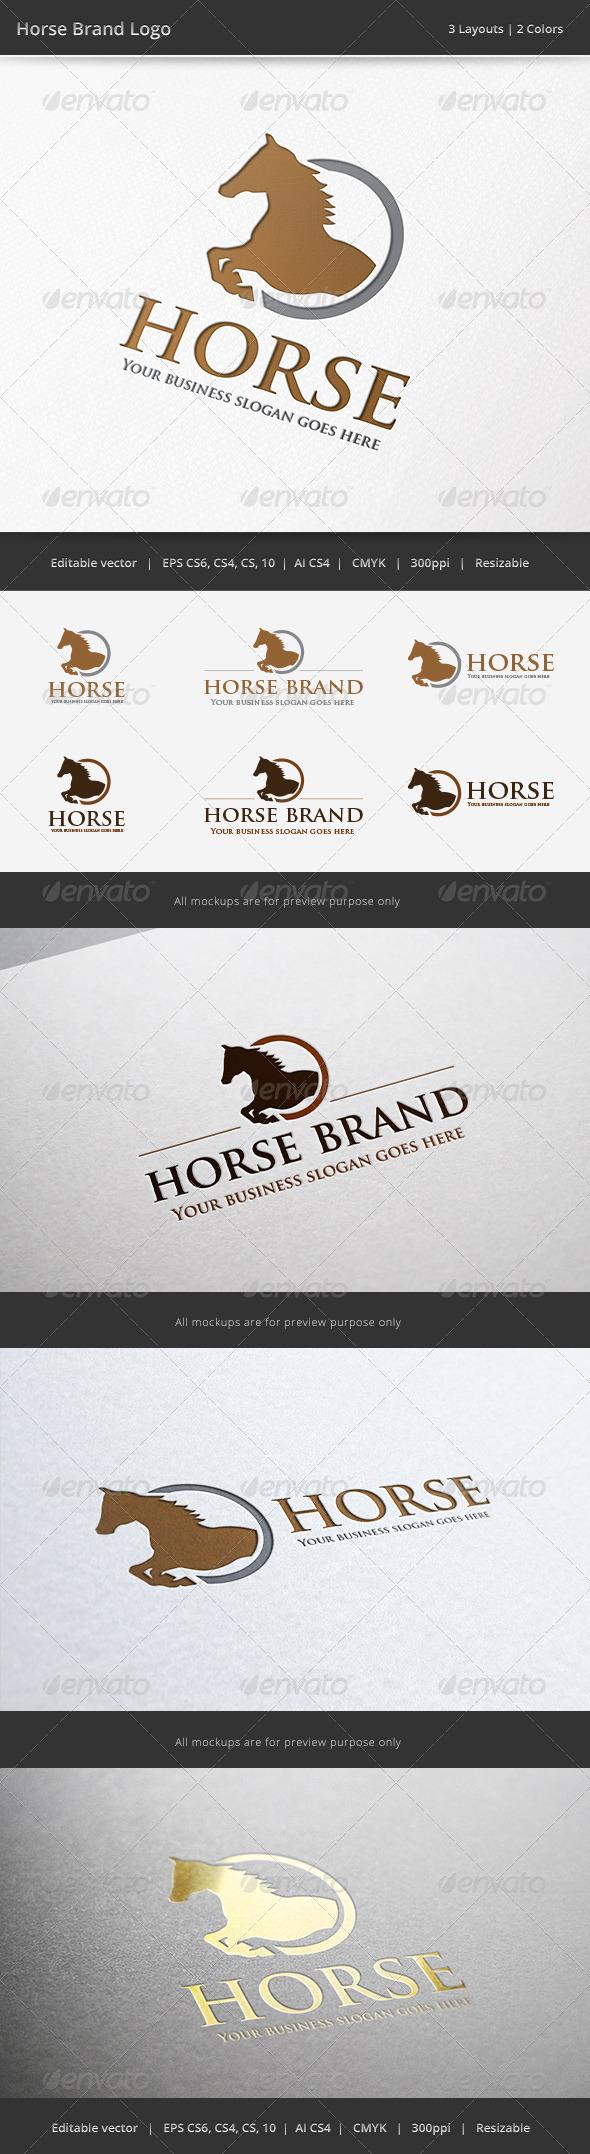 Horse Brand Logo - Animals Logo Templates